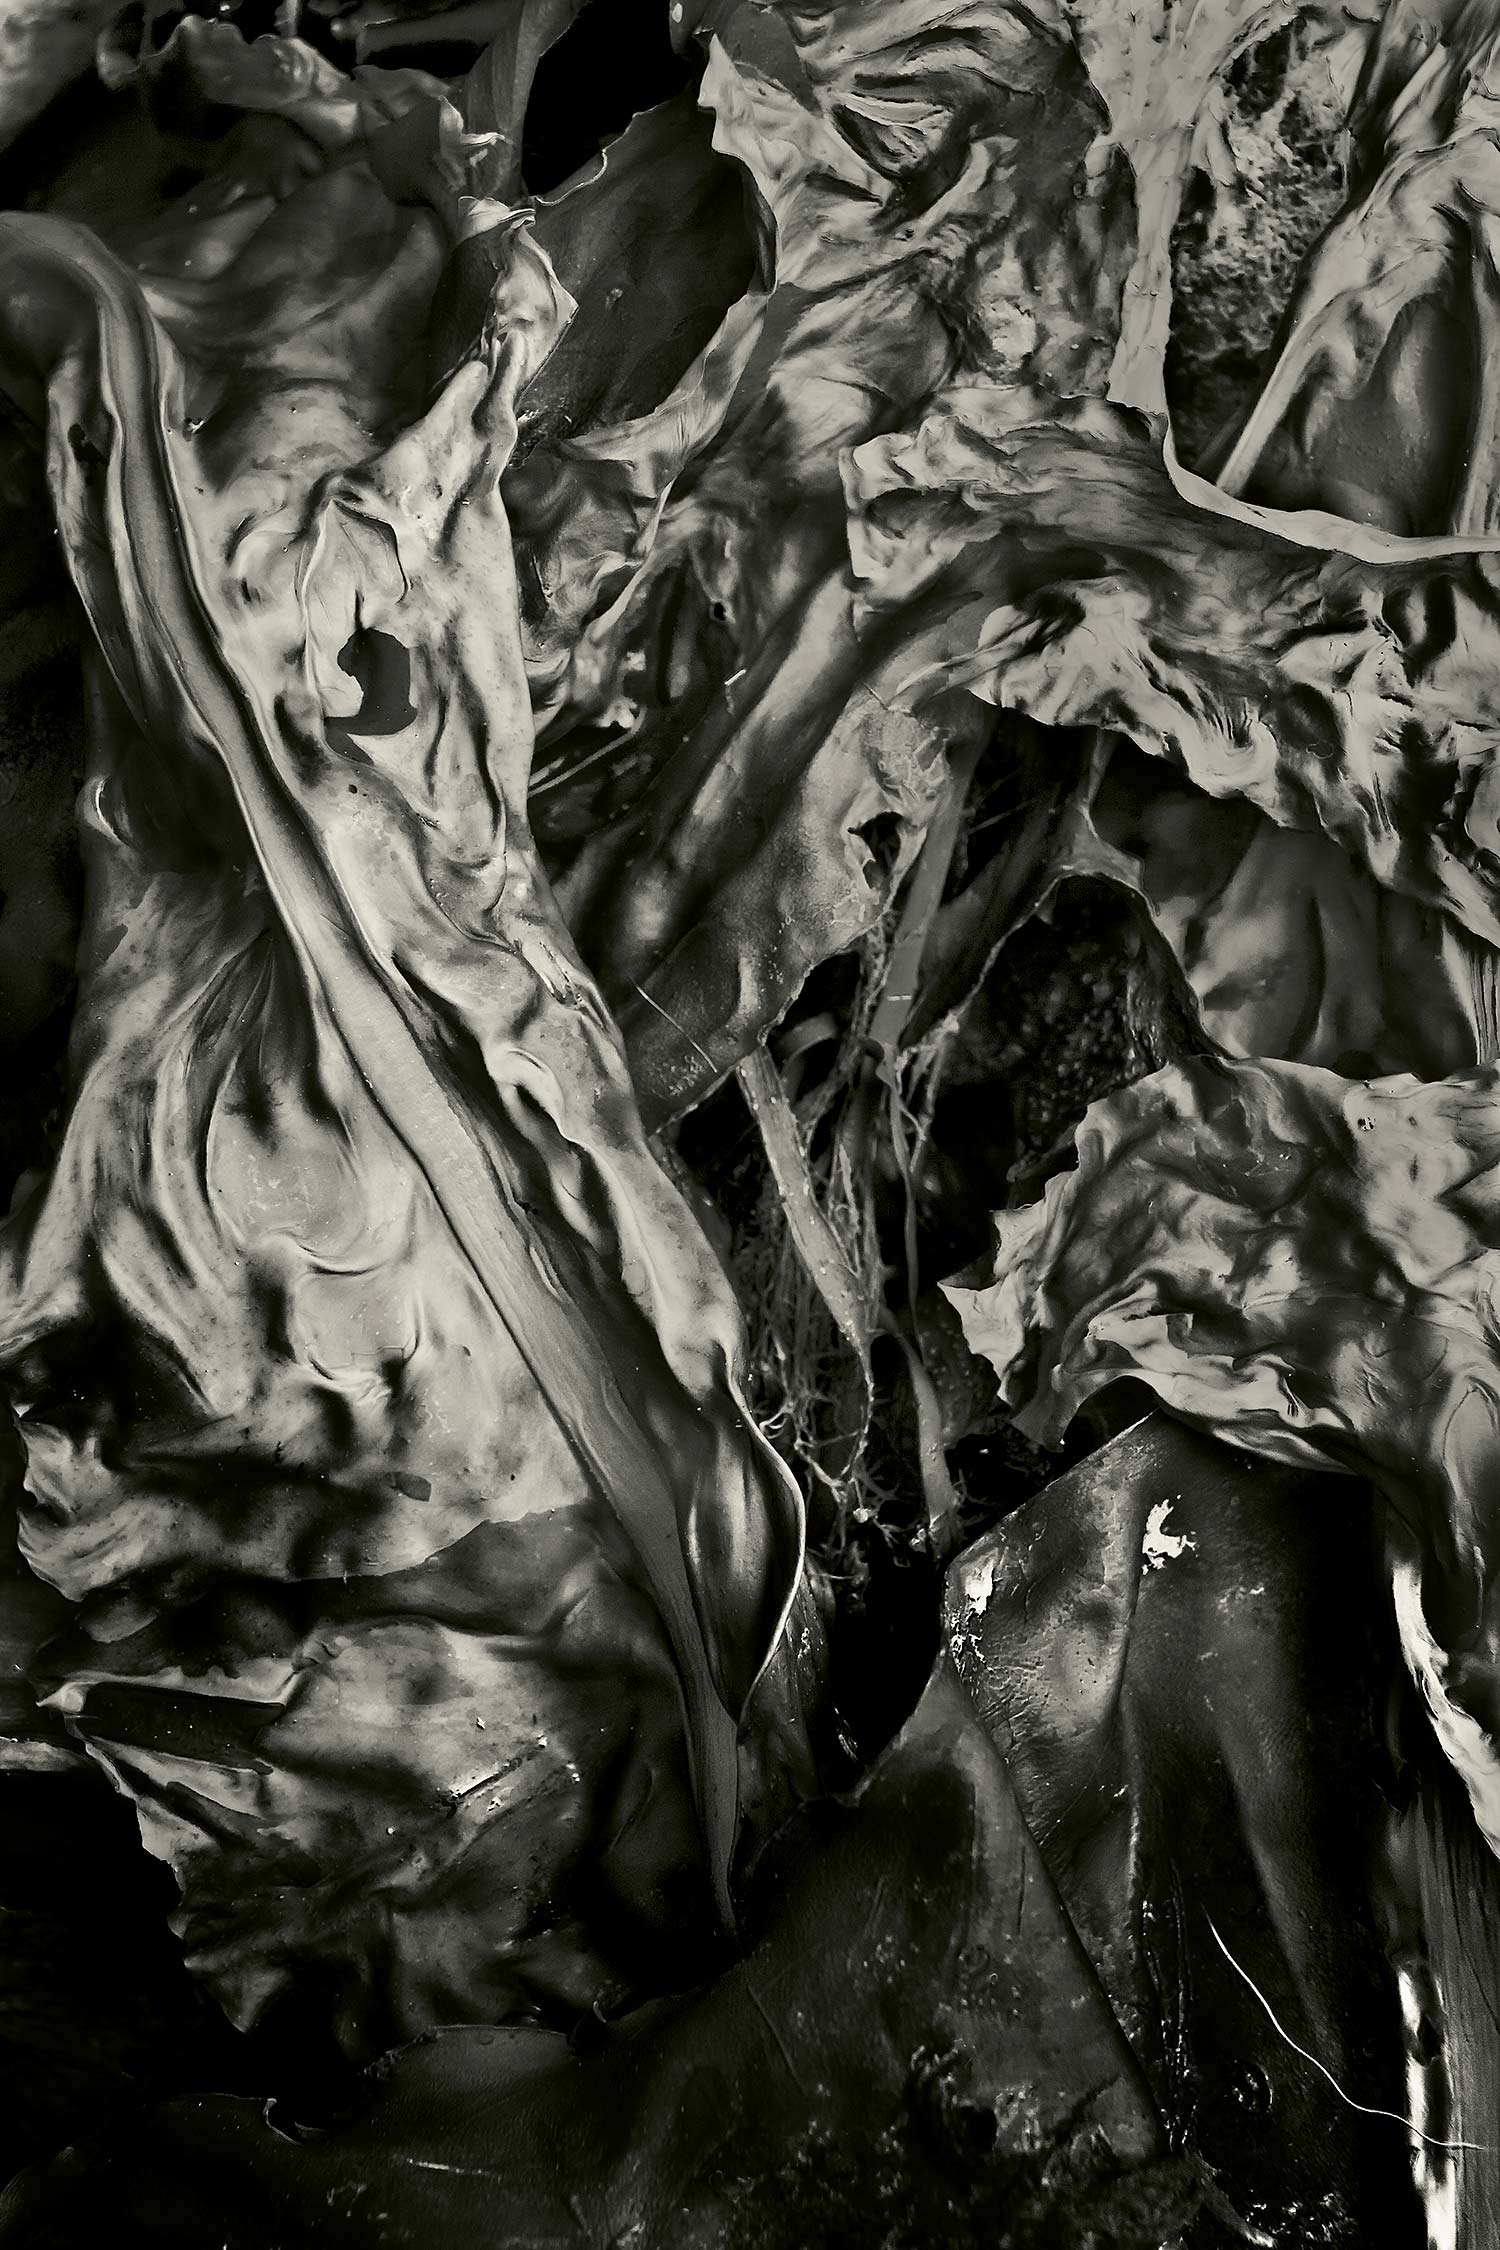 Seaweed 333, Seawall, Maine, 2011